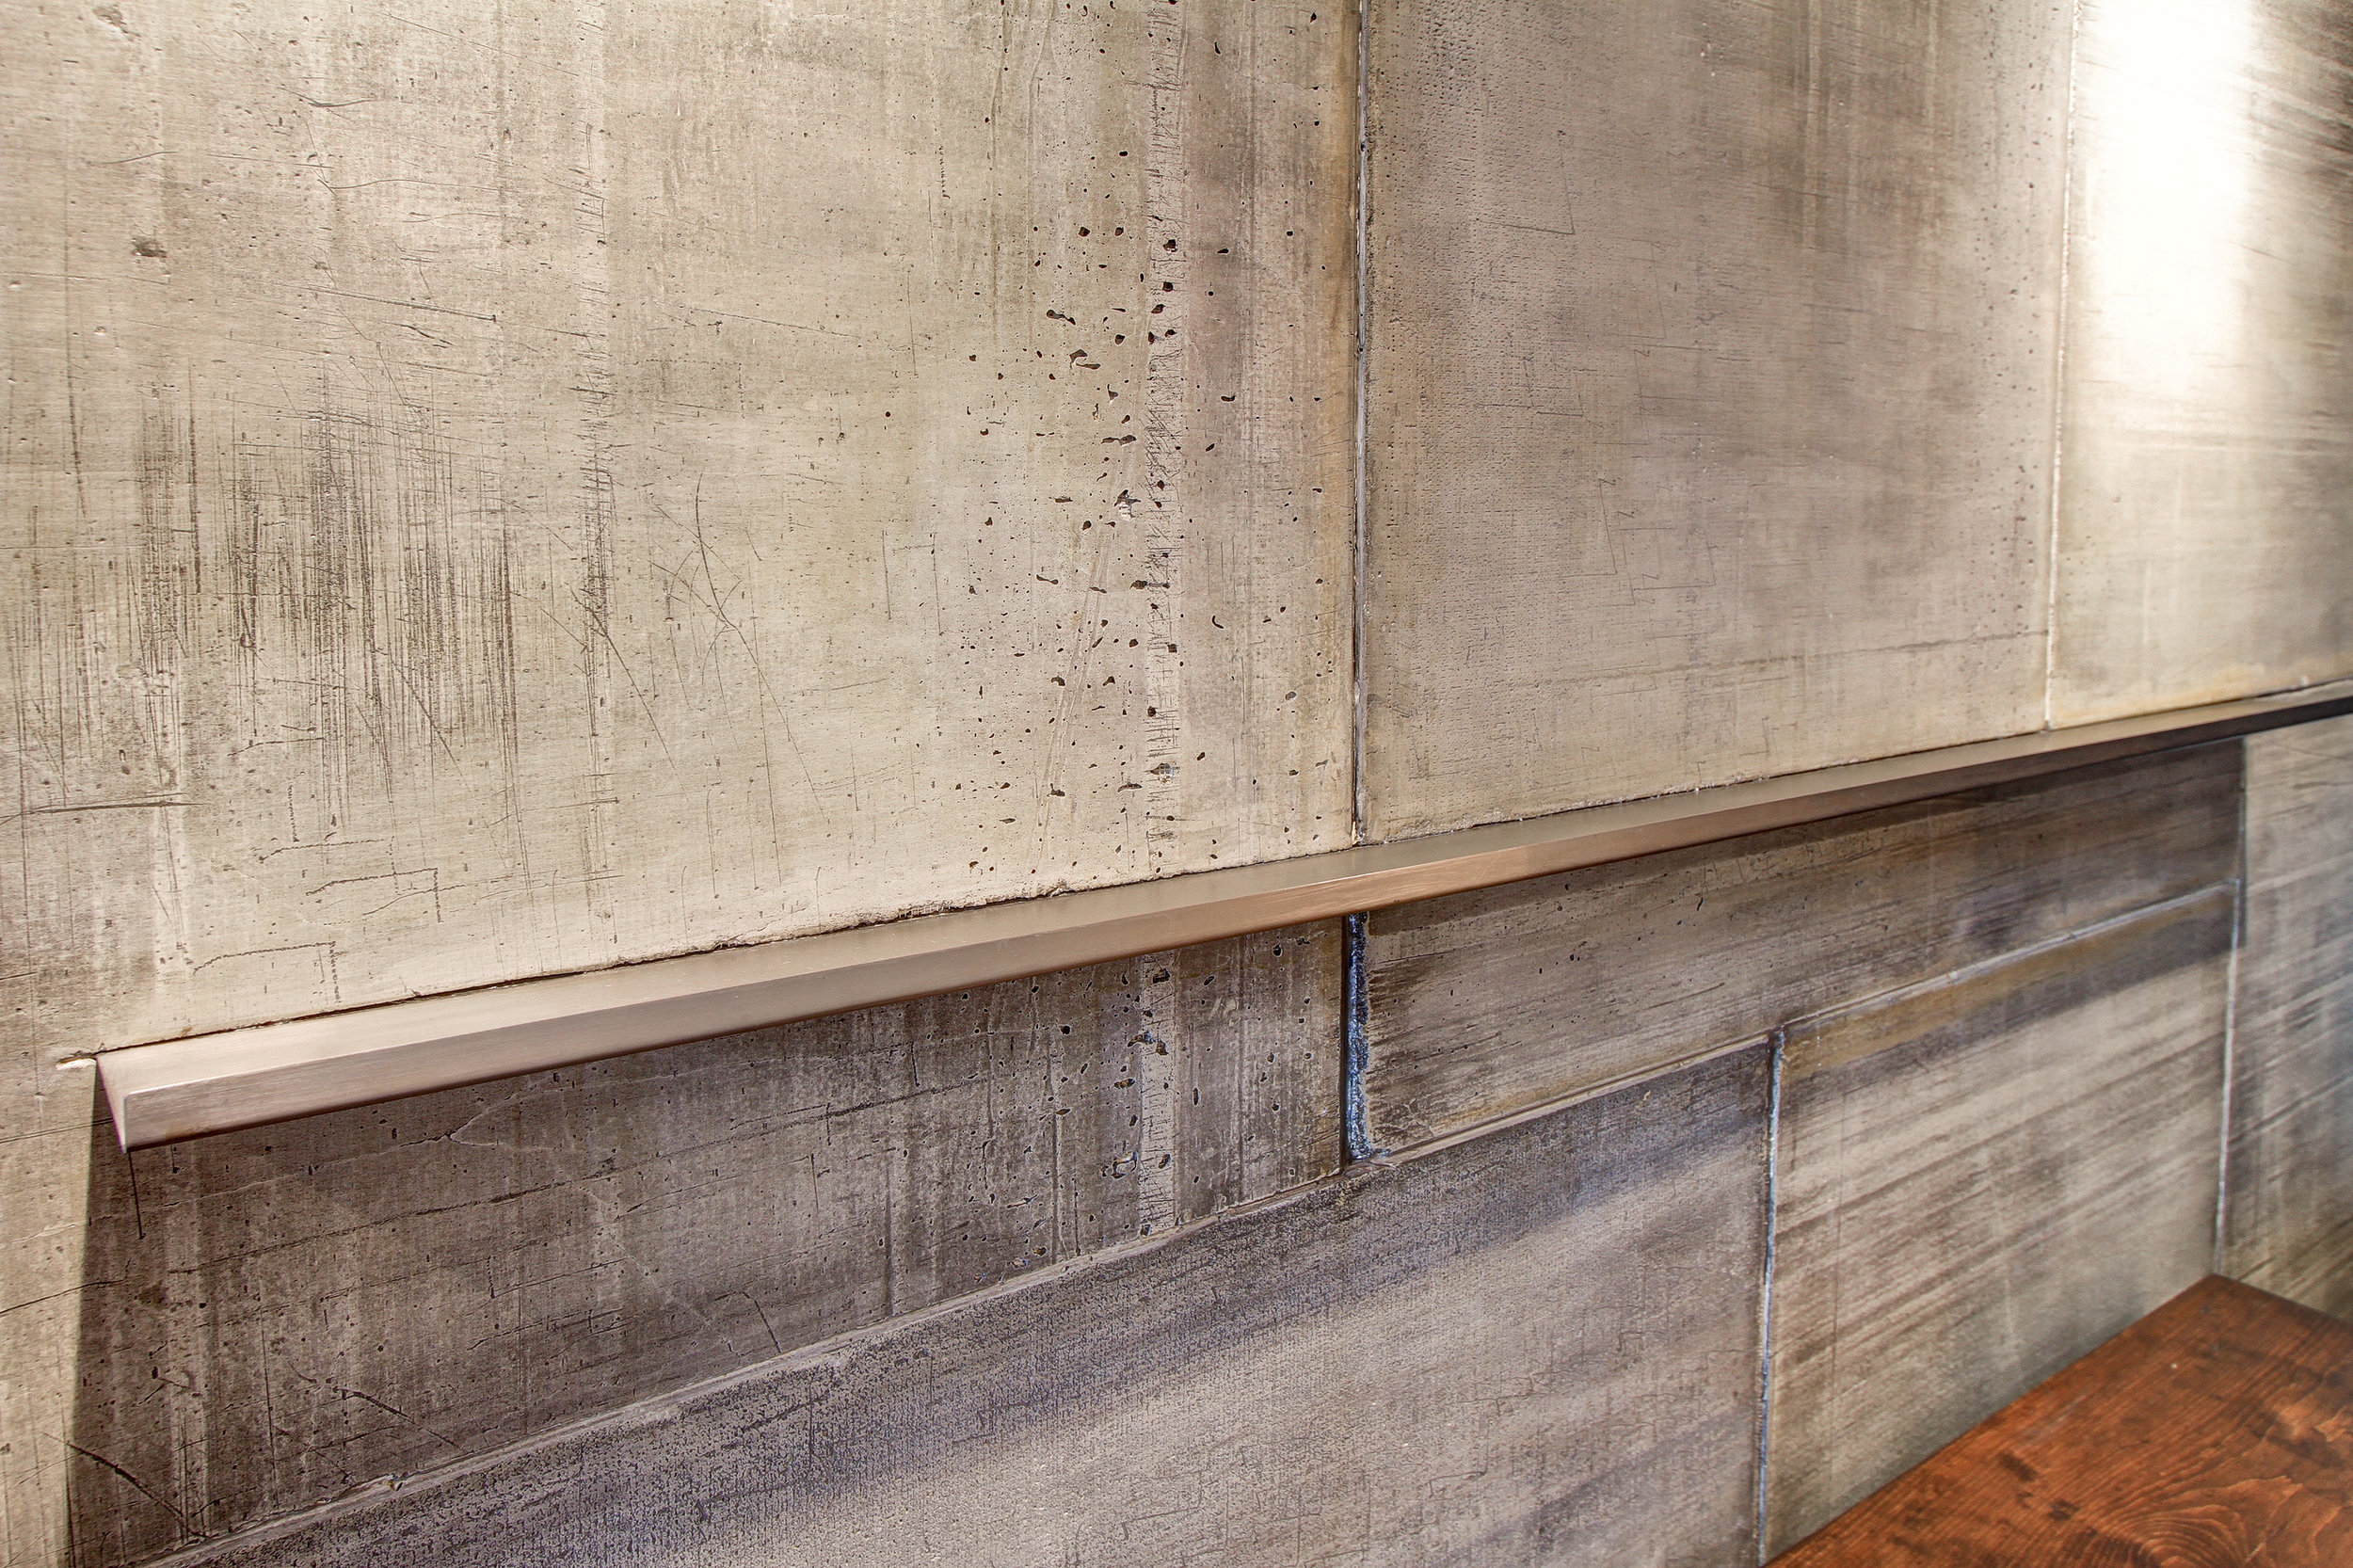 Condo-ConcreteWall2.jpg